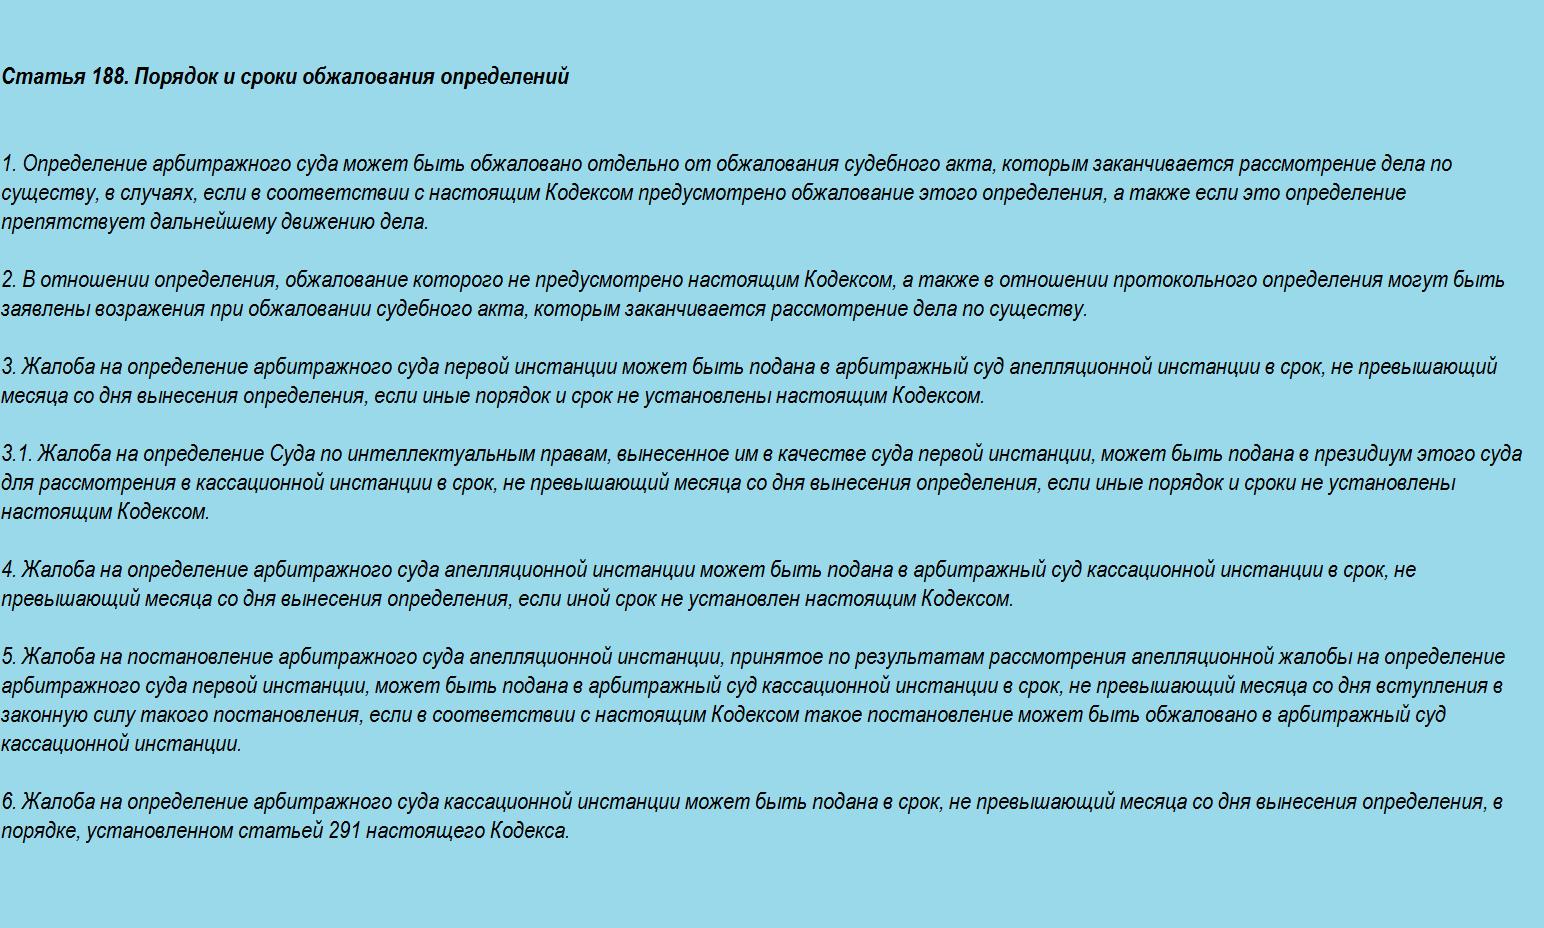 Апелляционная инстанция и подача апелляционного жалобы в суд (порядок, сроки, условия)